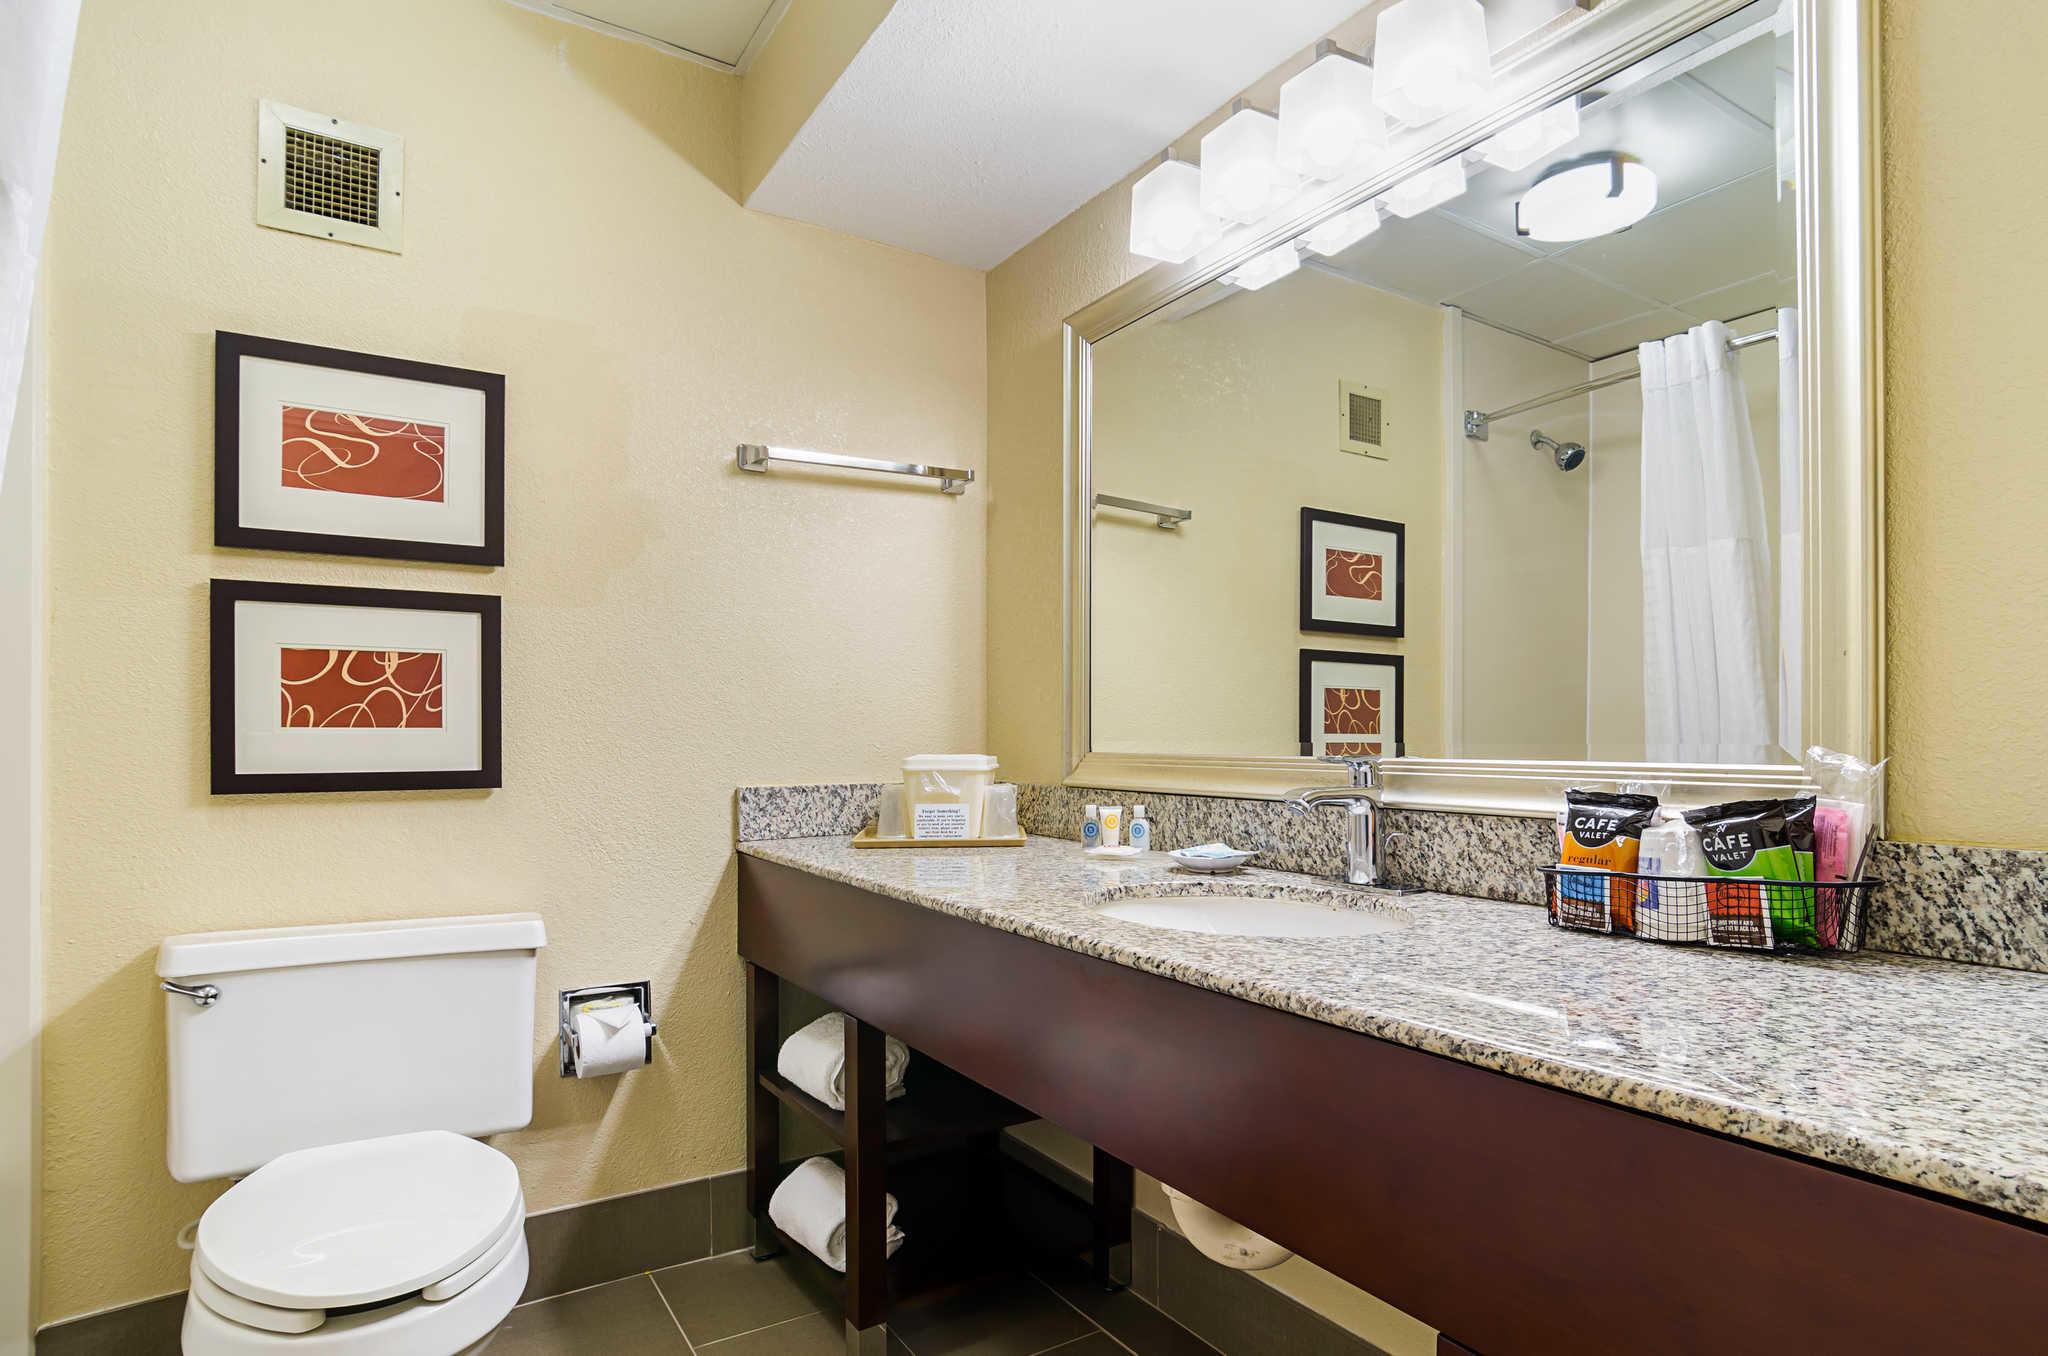 Comfort Inn & Suites Duke University-Downtown image 24